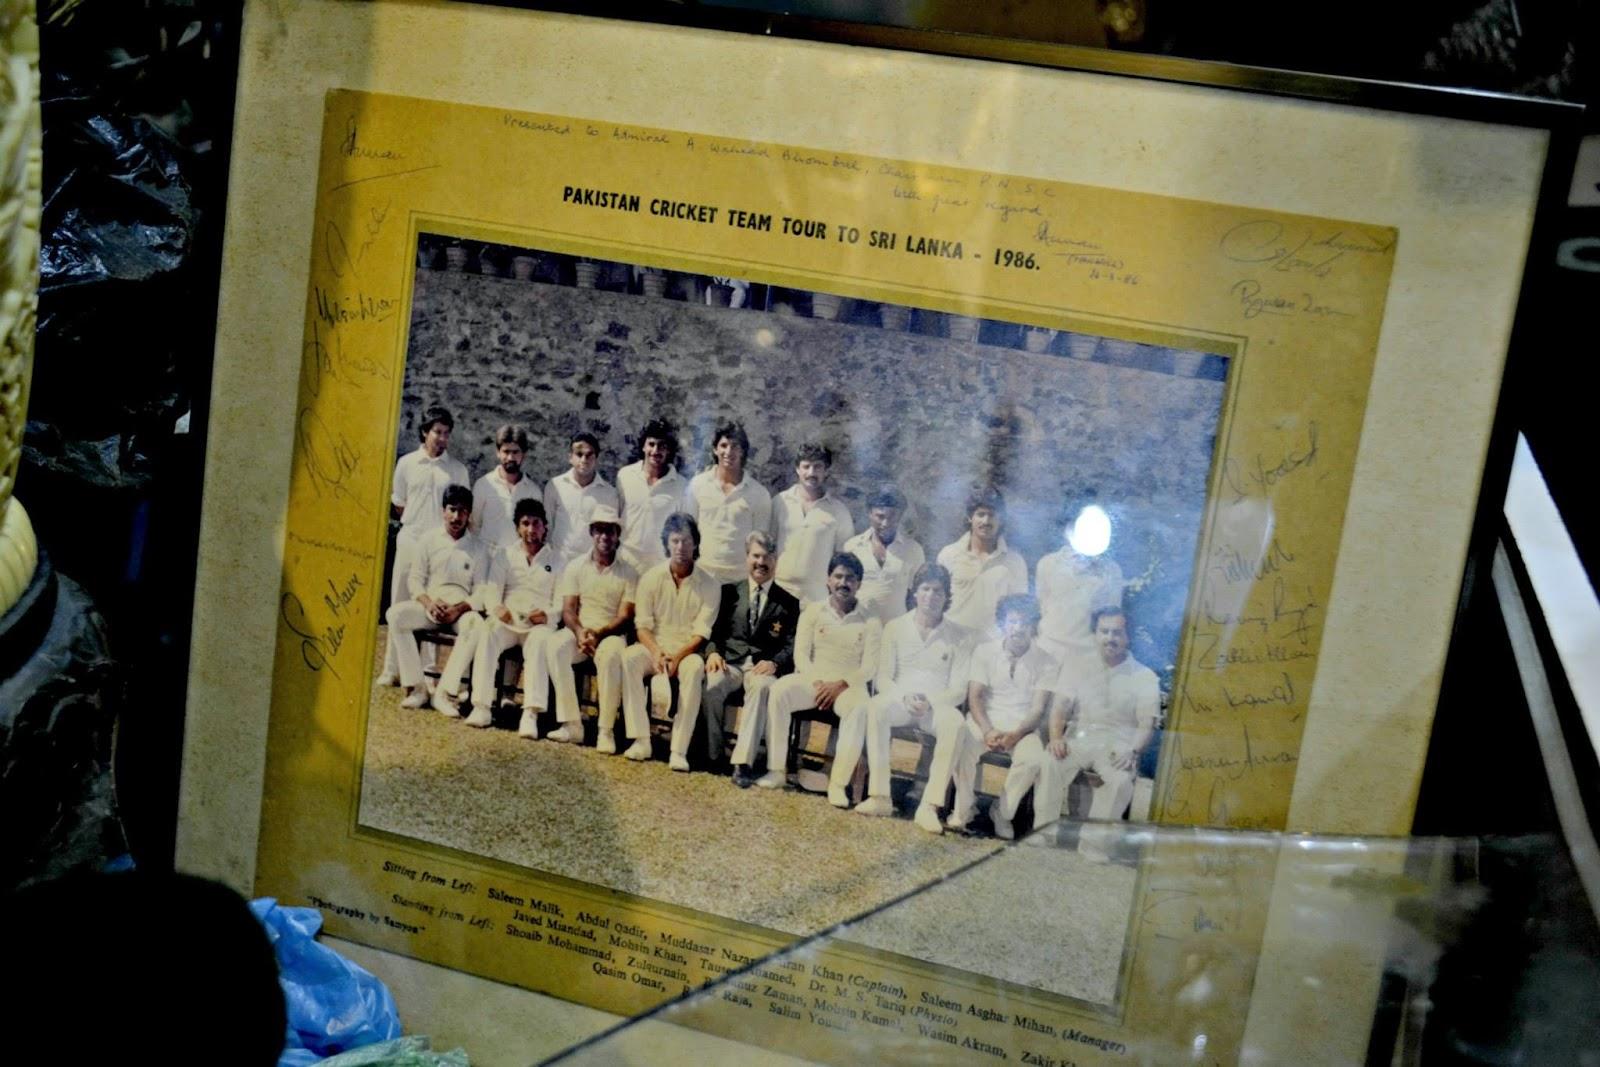 imran khan javed miandad cricket team photo